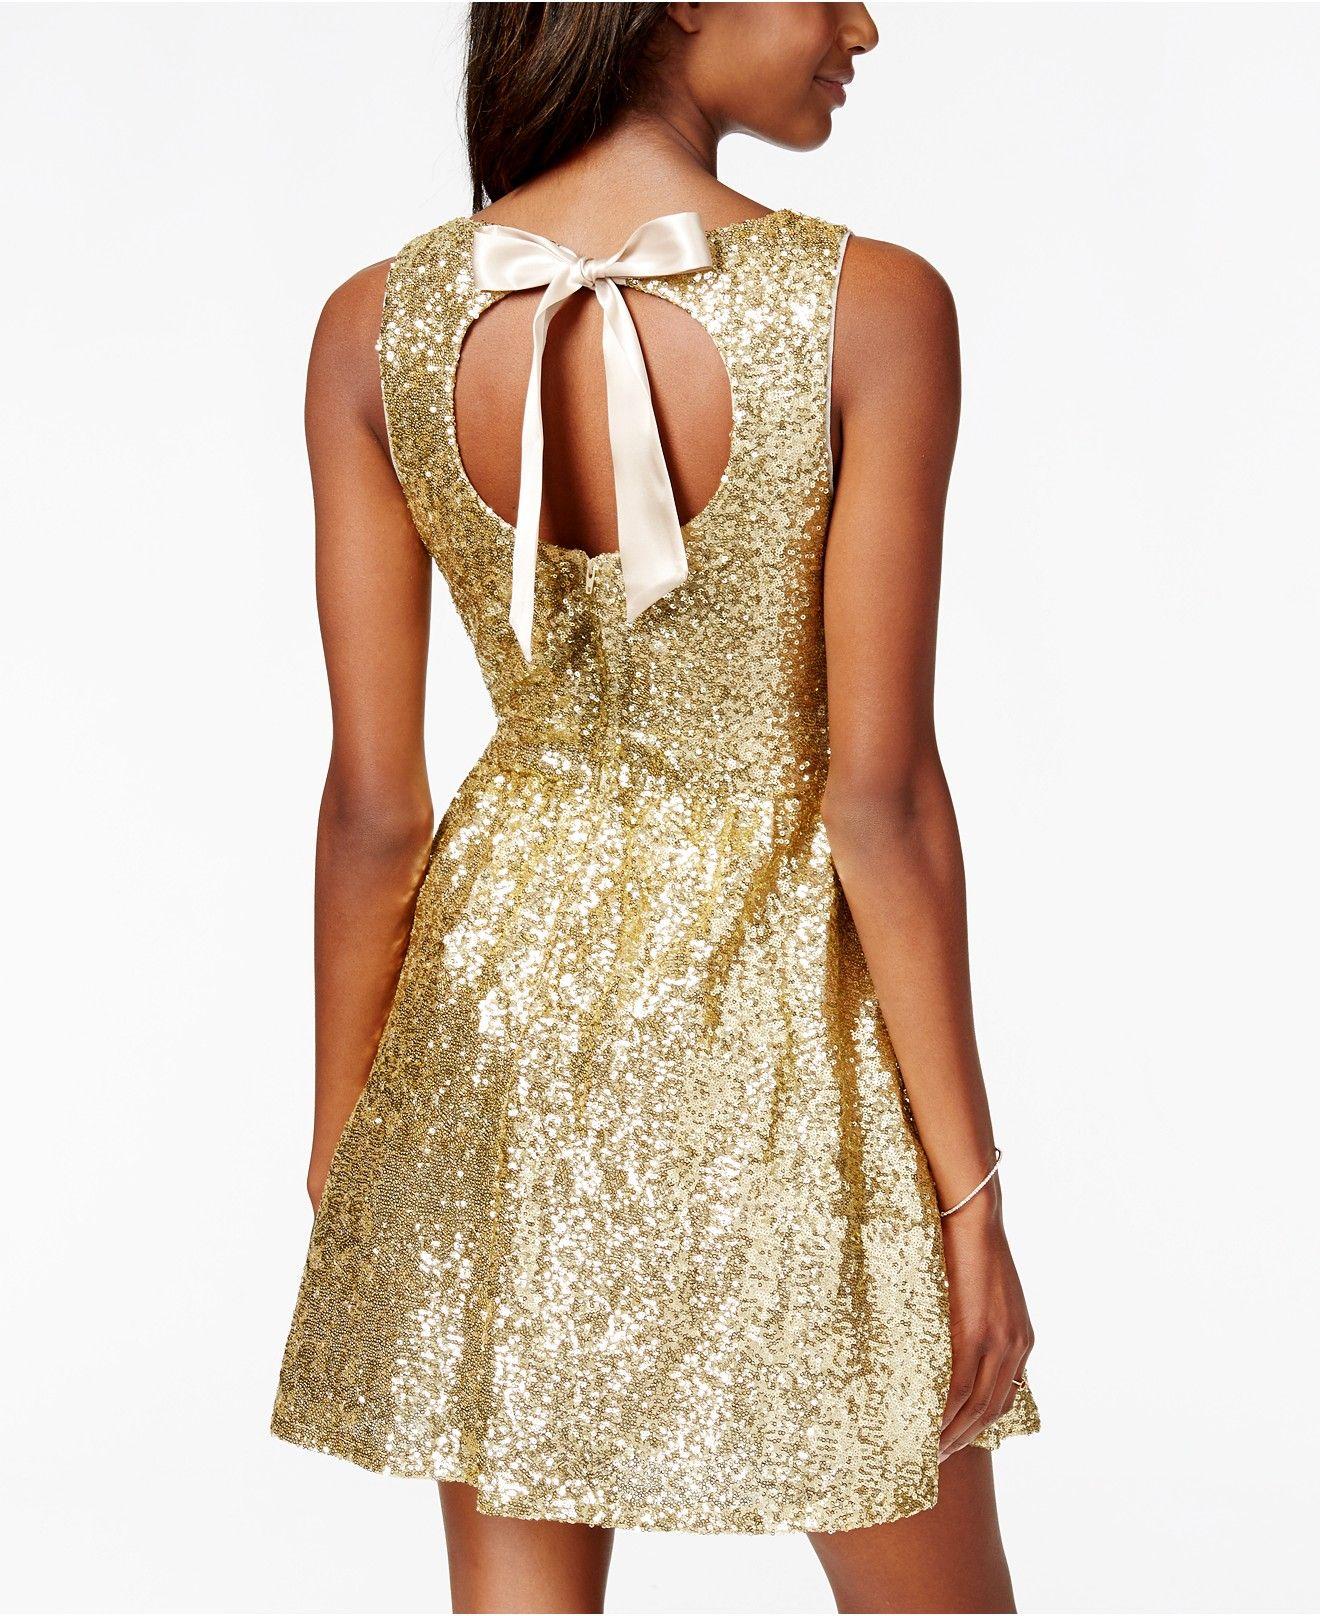 ae37b32178 B Darlin Juniors  Sequin Bow-Back Fit-and-Flare Dress - Juniors Dresses -  Macy s